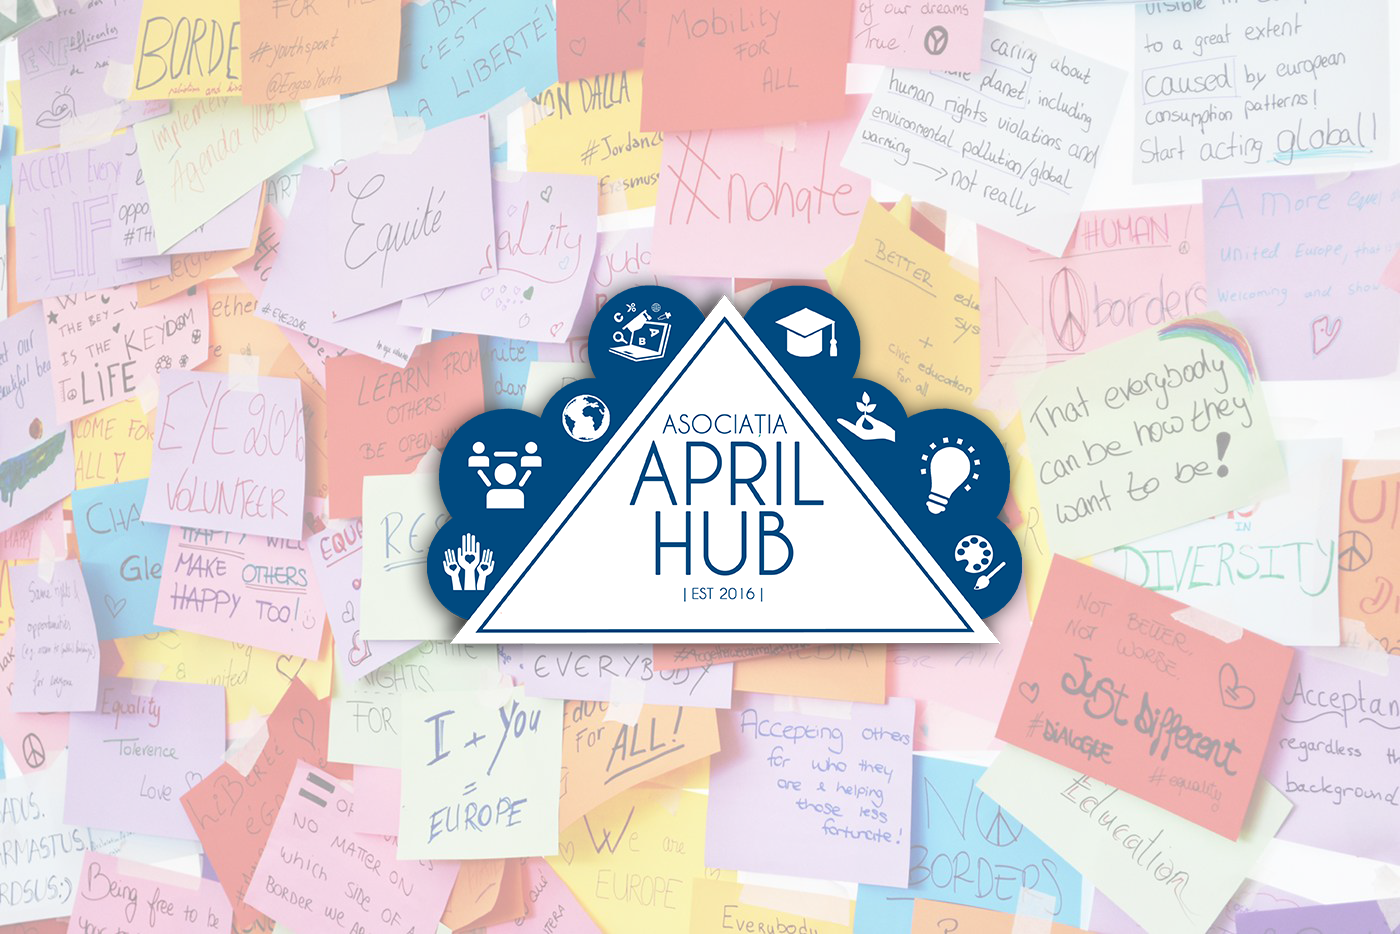 Asociația April Hub logo